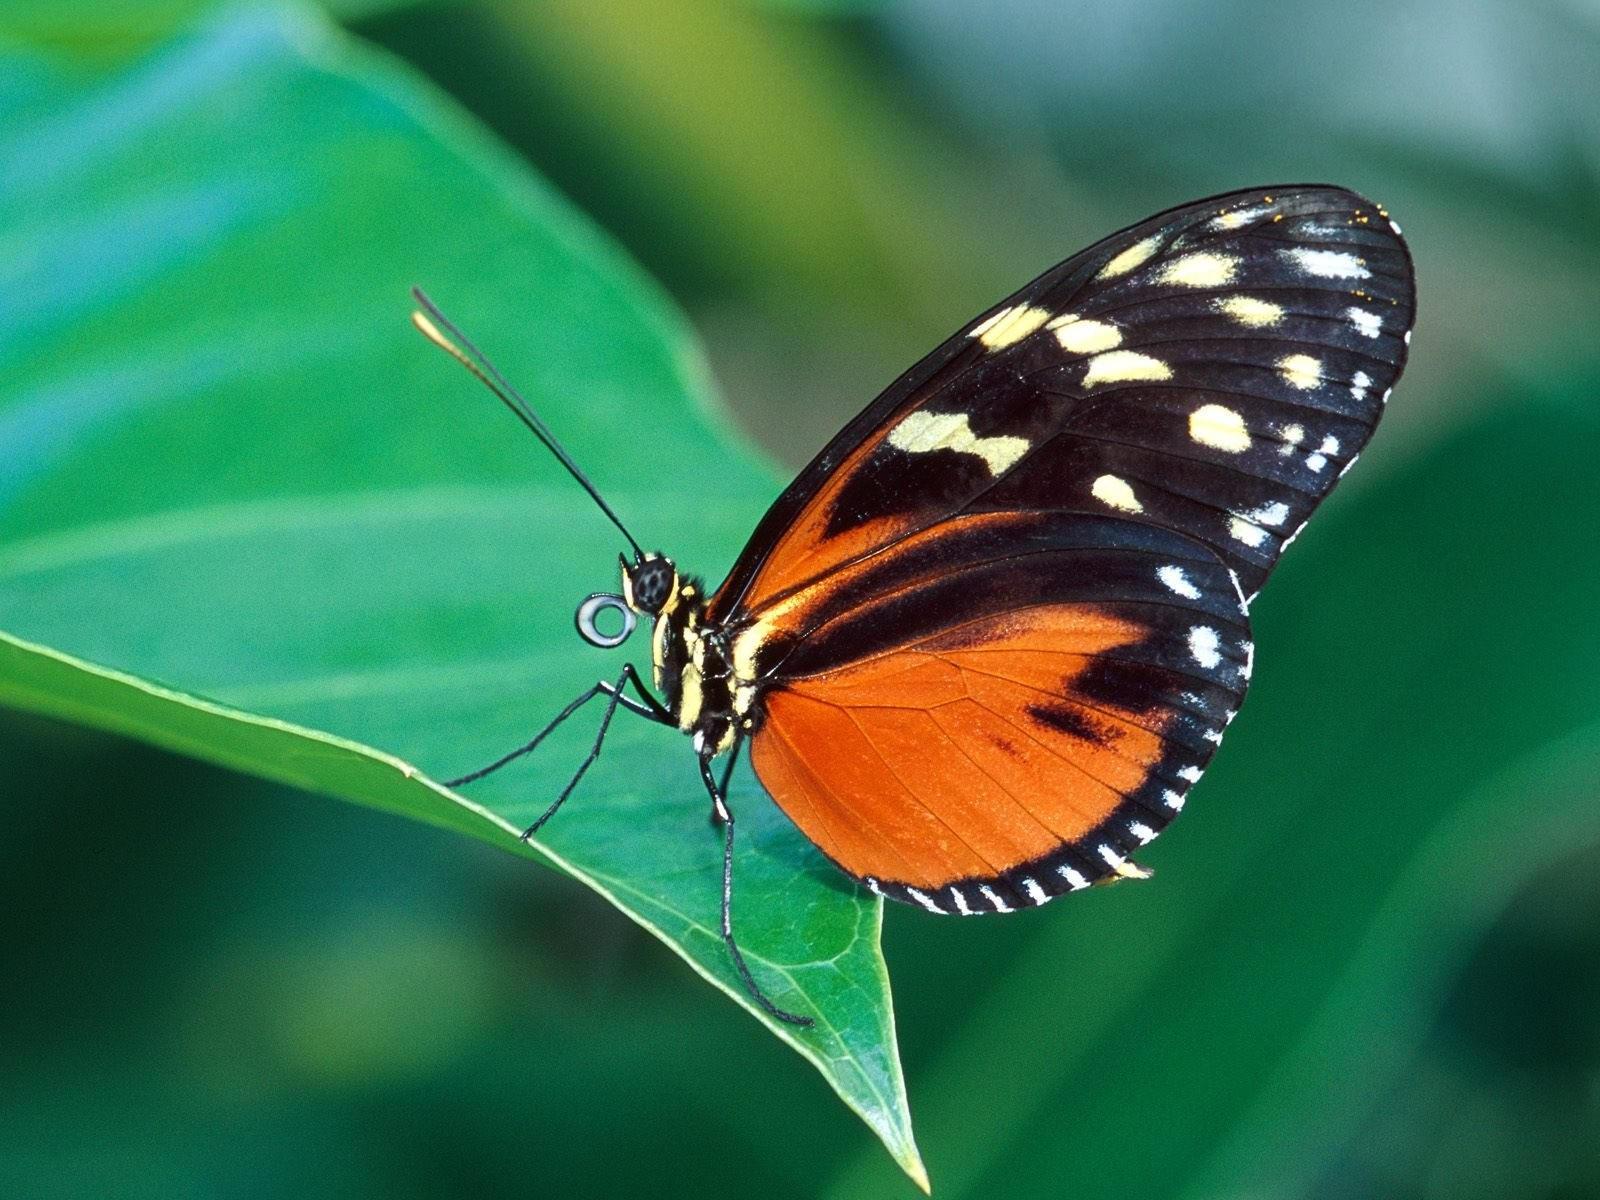 Черно-оранжевая бабочка на листе